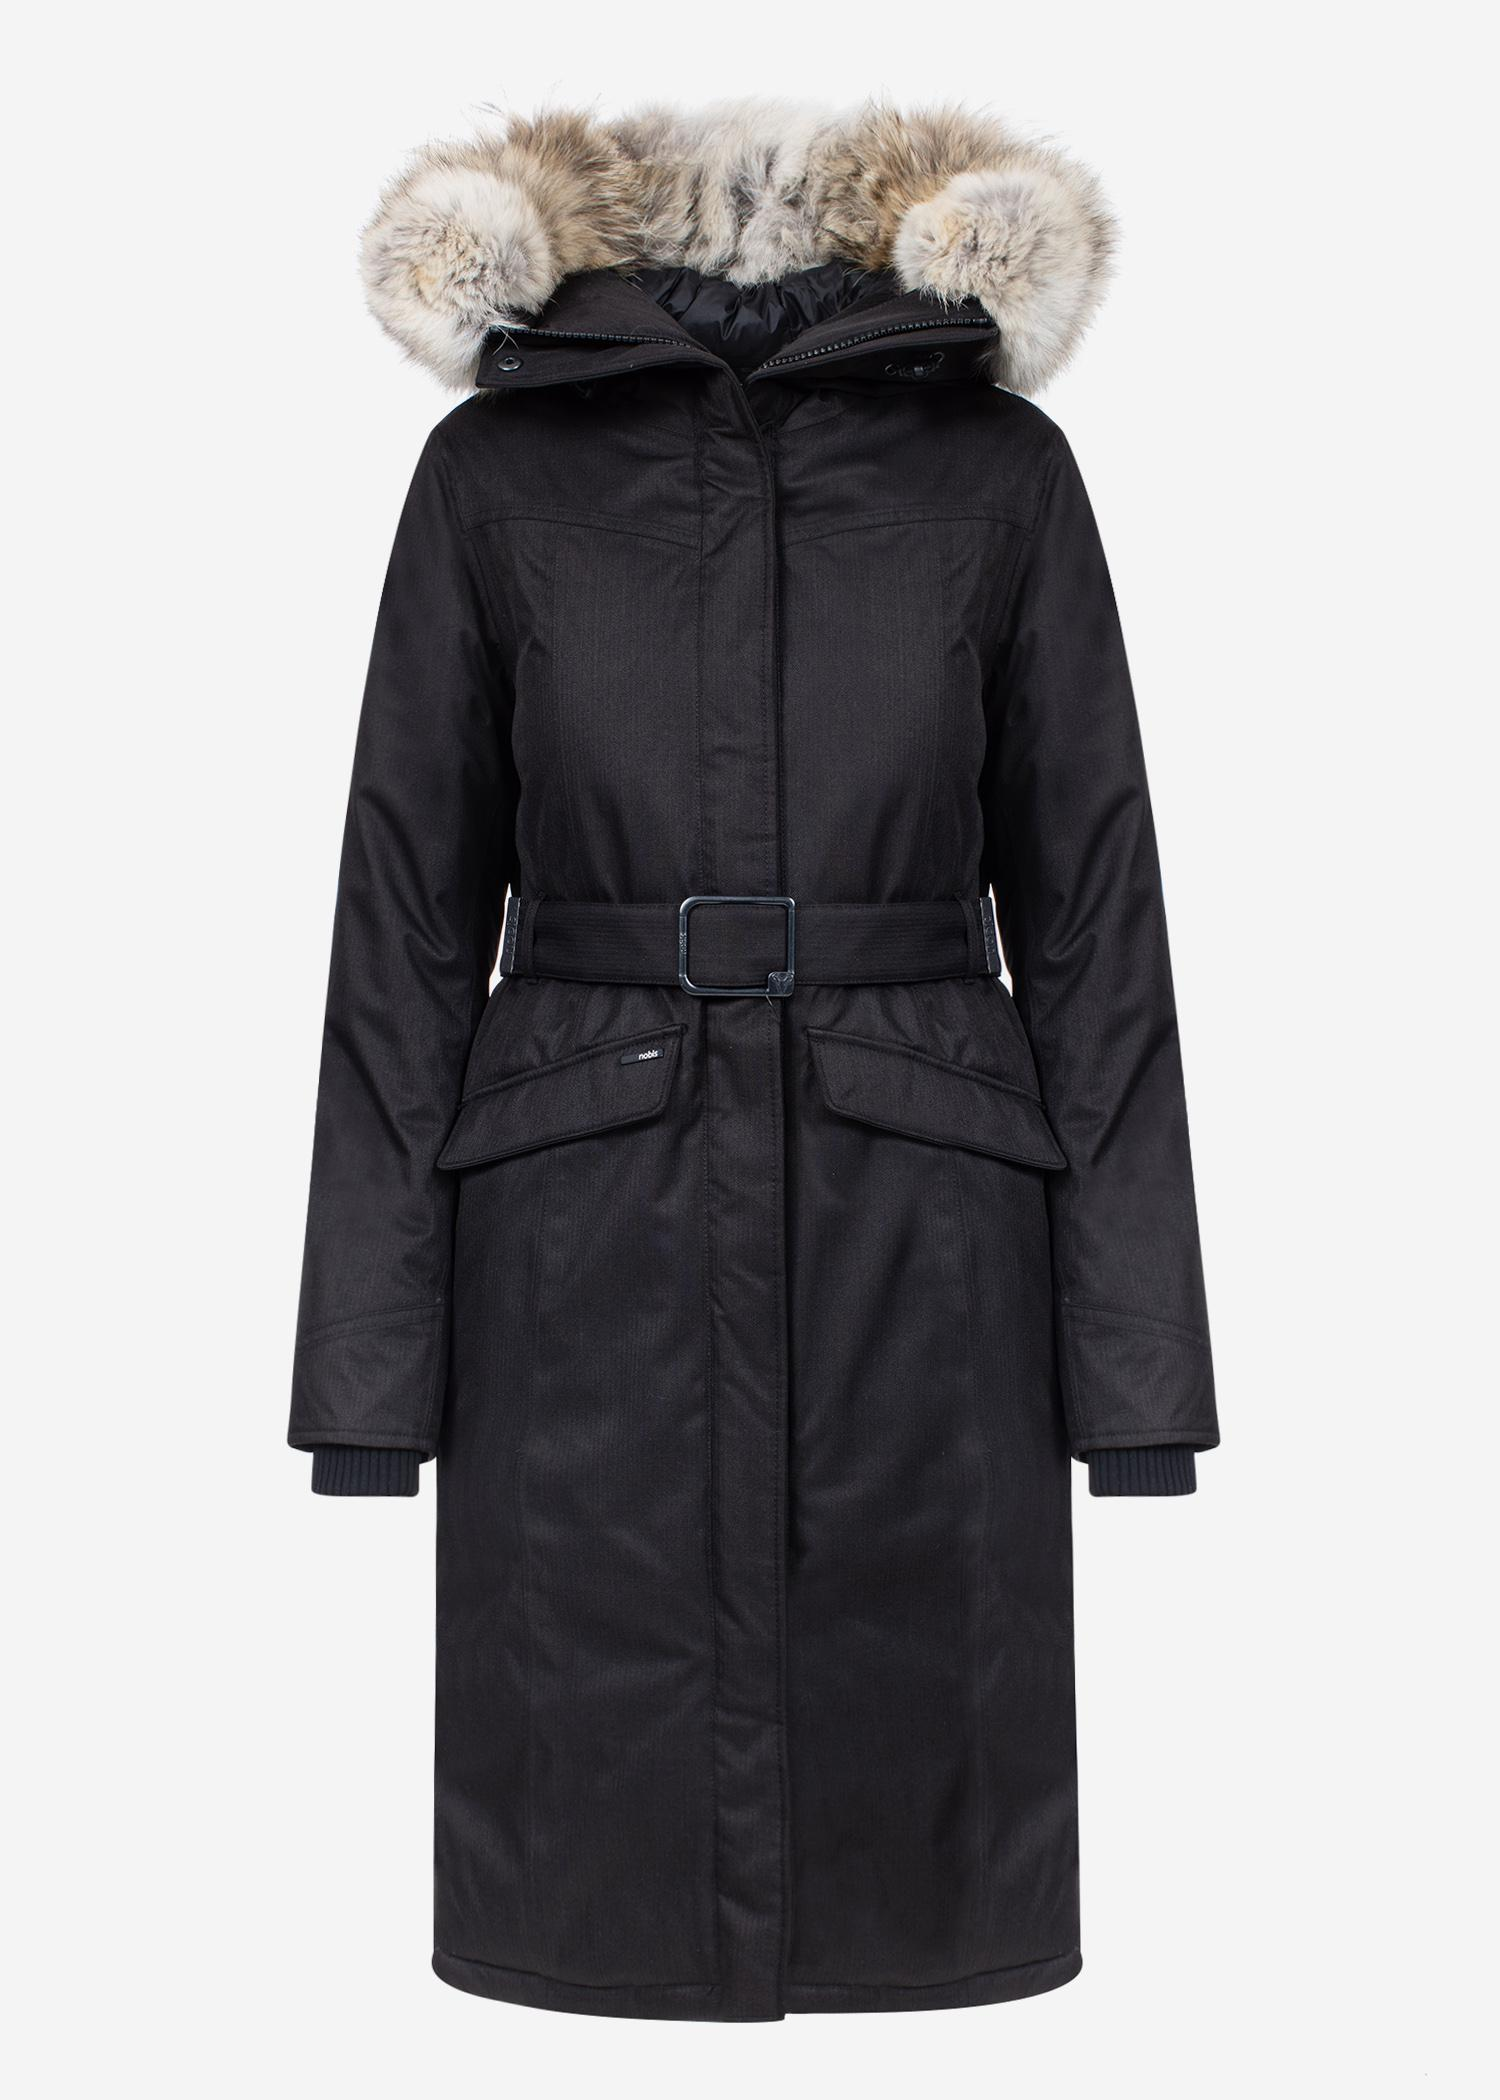 9bbe8bfa0 Lyst - Nobis Morgan Ladies Parka in Black